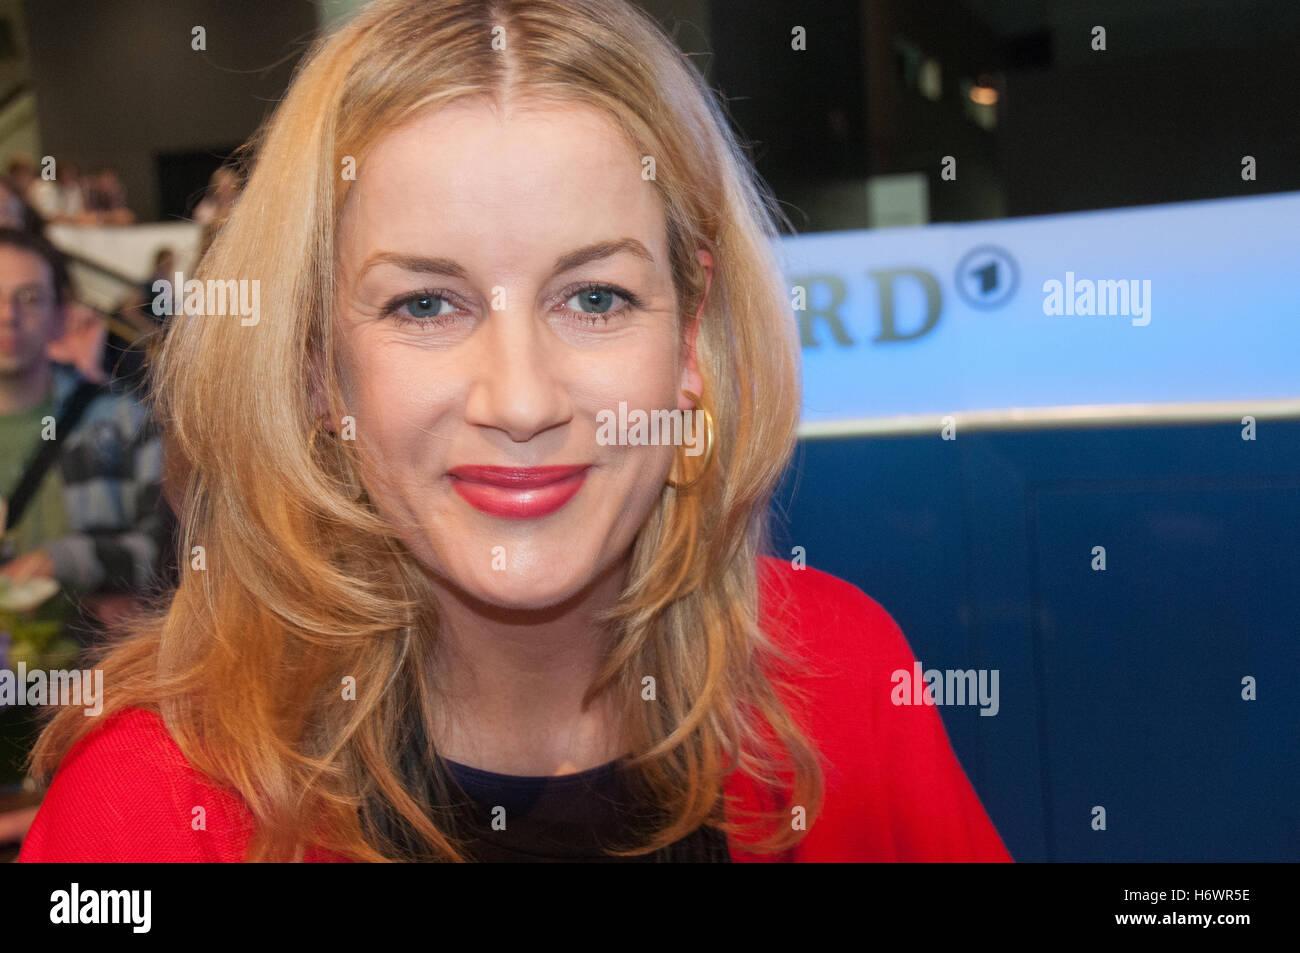 German actress Alexa Maria Surholt (In Aller Freundschaft) signed autographs after a panel about the showFrankfurt - Stock Image